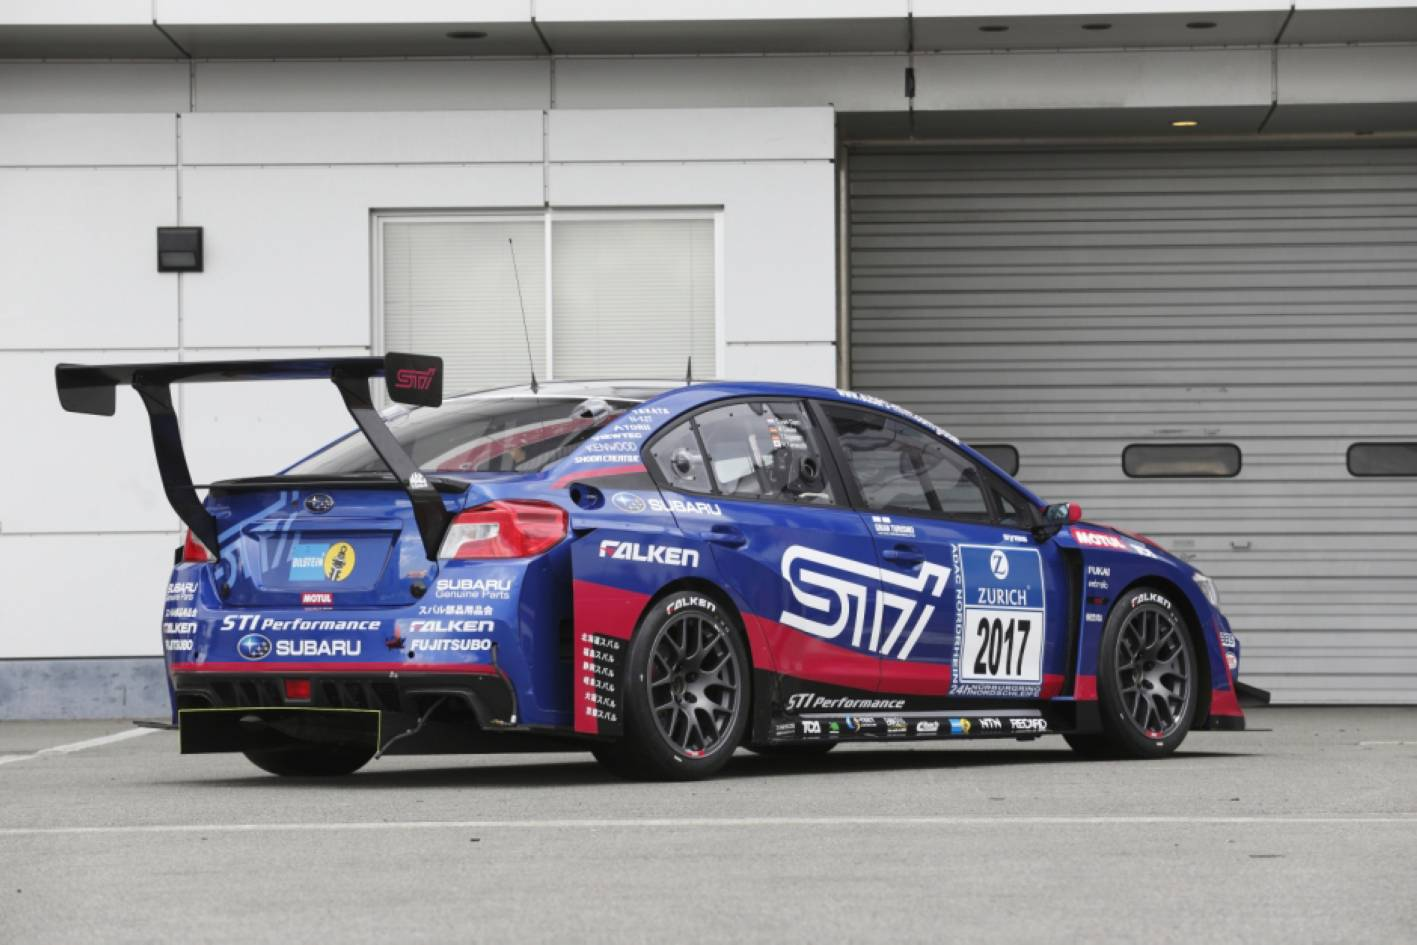 Subaru WRX STI aiming for third Nürburgring 24h race victory